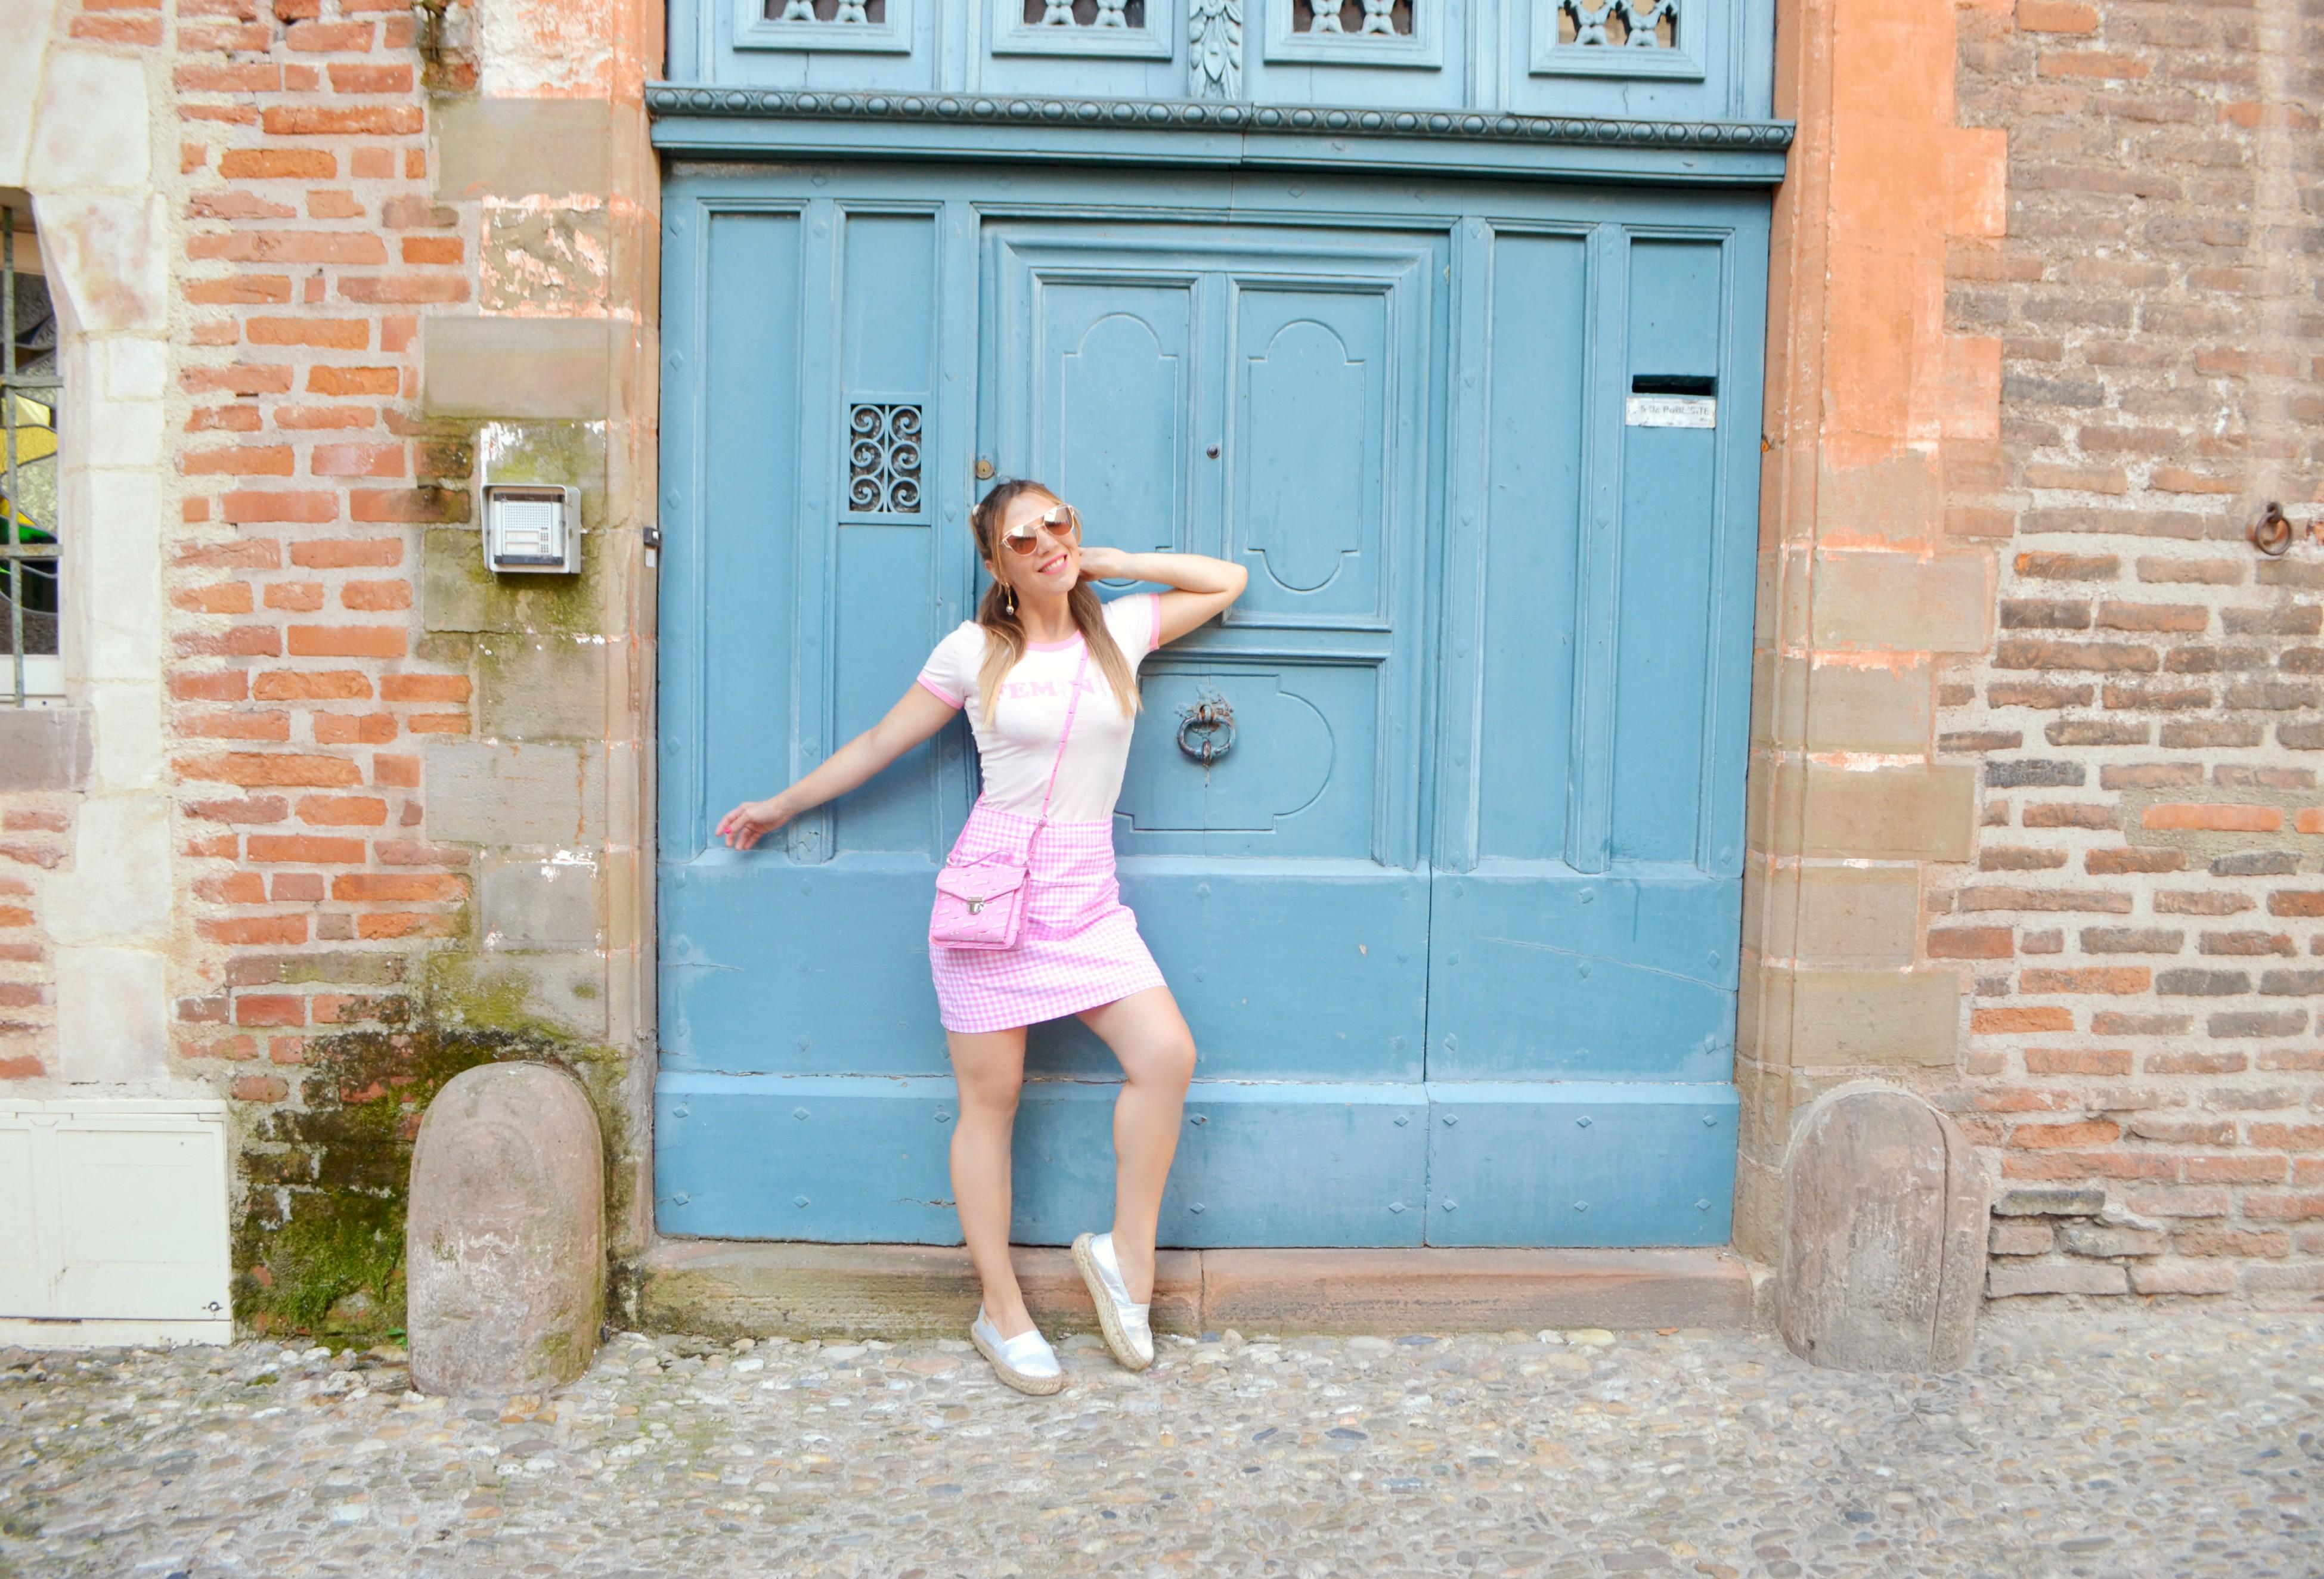 Blog-de-moda-ChicAdicta-influencer-Madrid-Chic-Adicta-fashionista-verono-alpargatas-busonier-Albi-Francia-PiensaenChic-Piensa-en-Chic